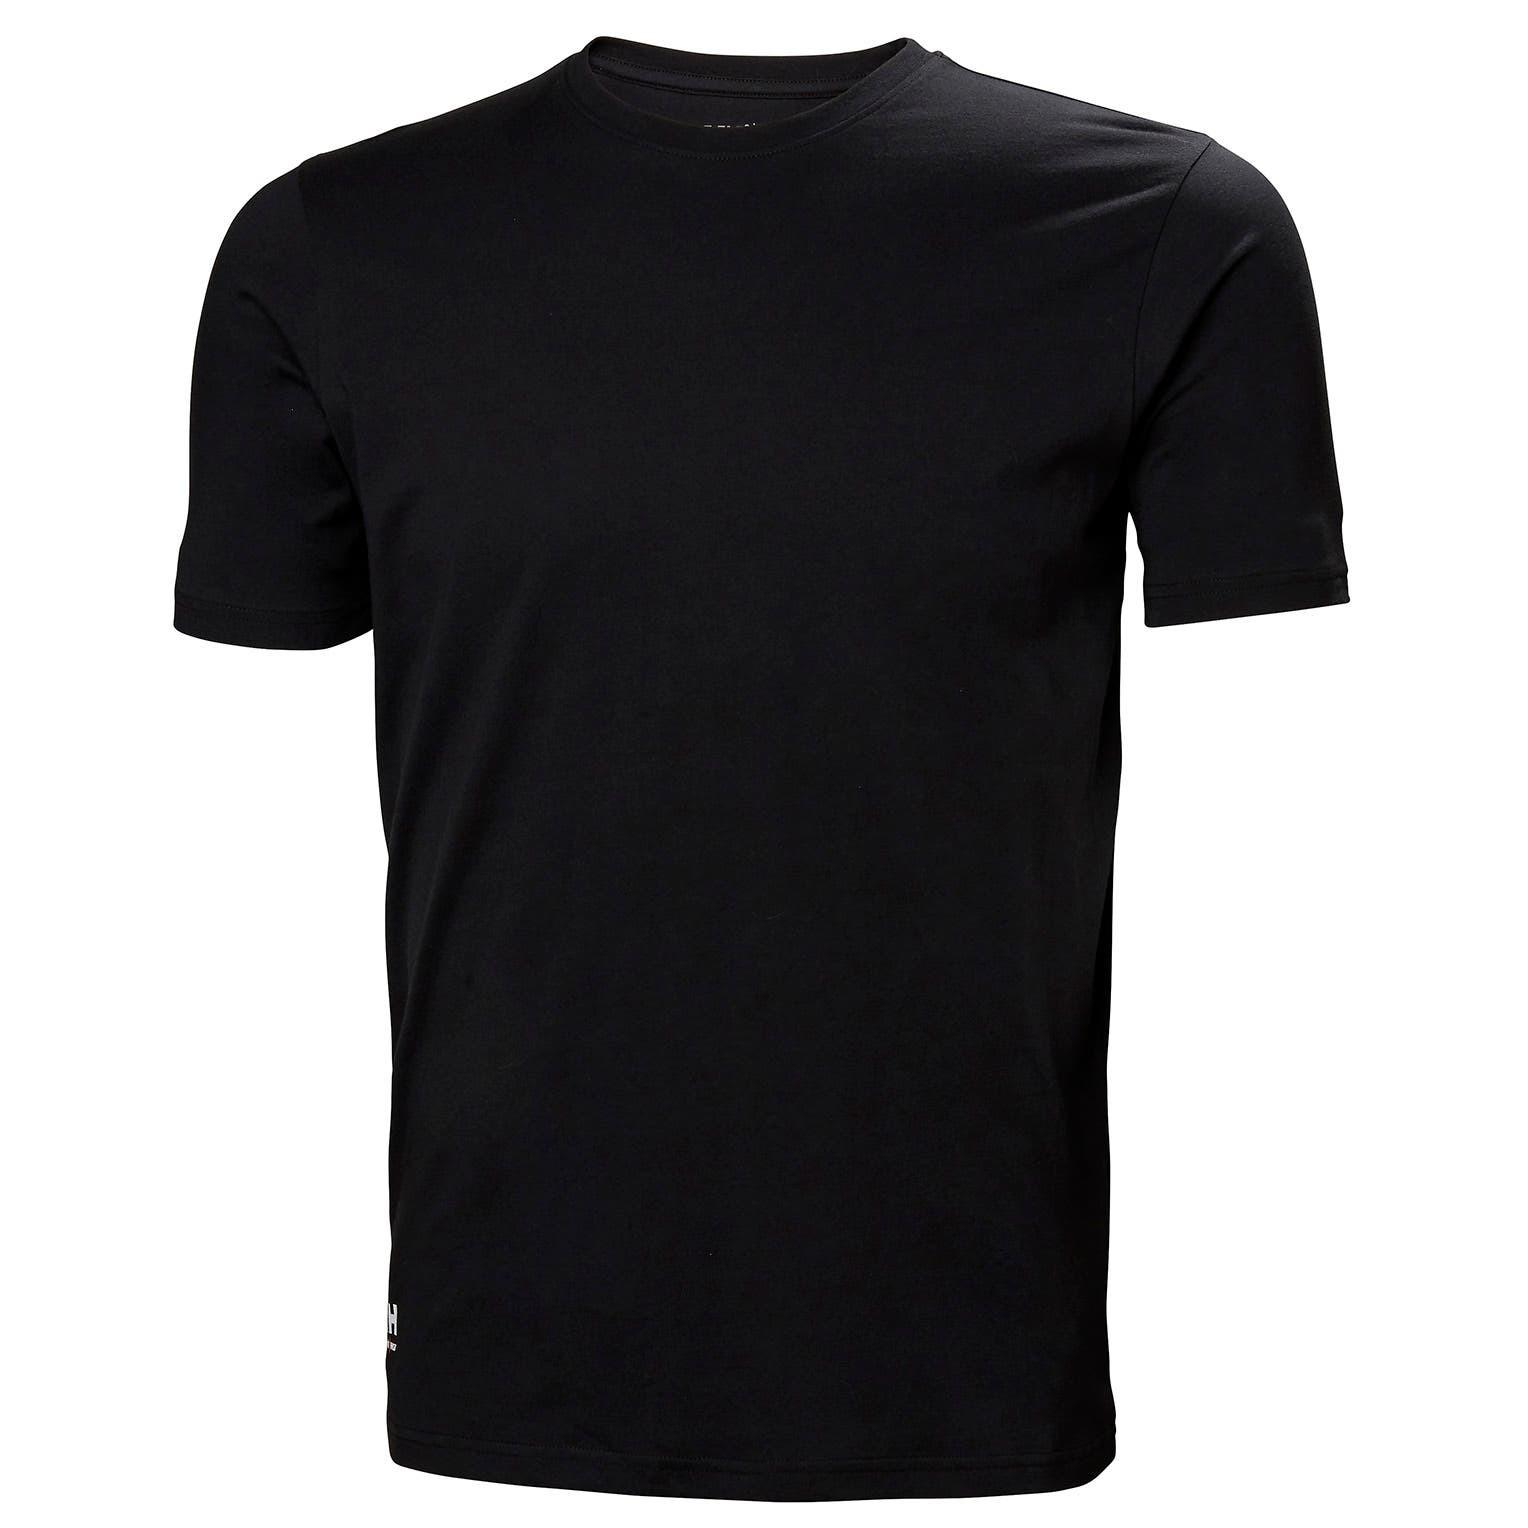 Футболка Helly Hansen Manchester T-Shirt - 79161 (Black; XL)